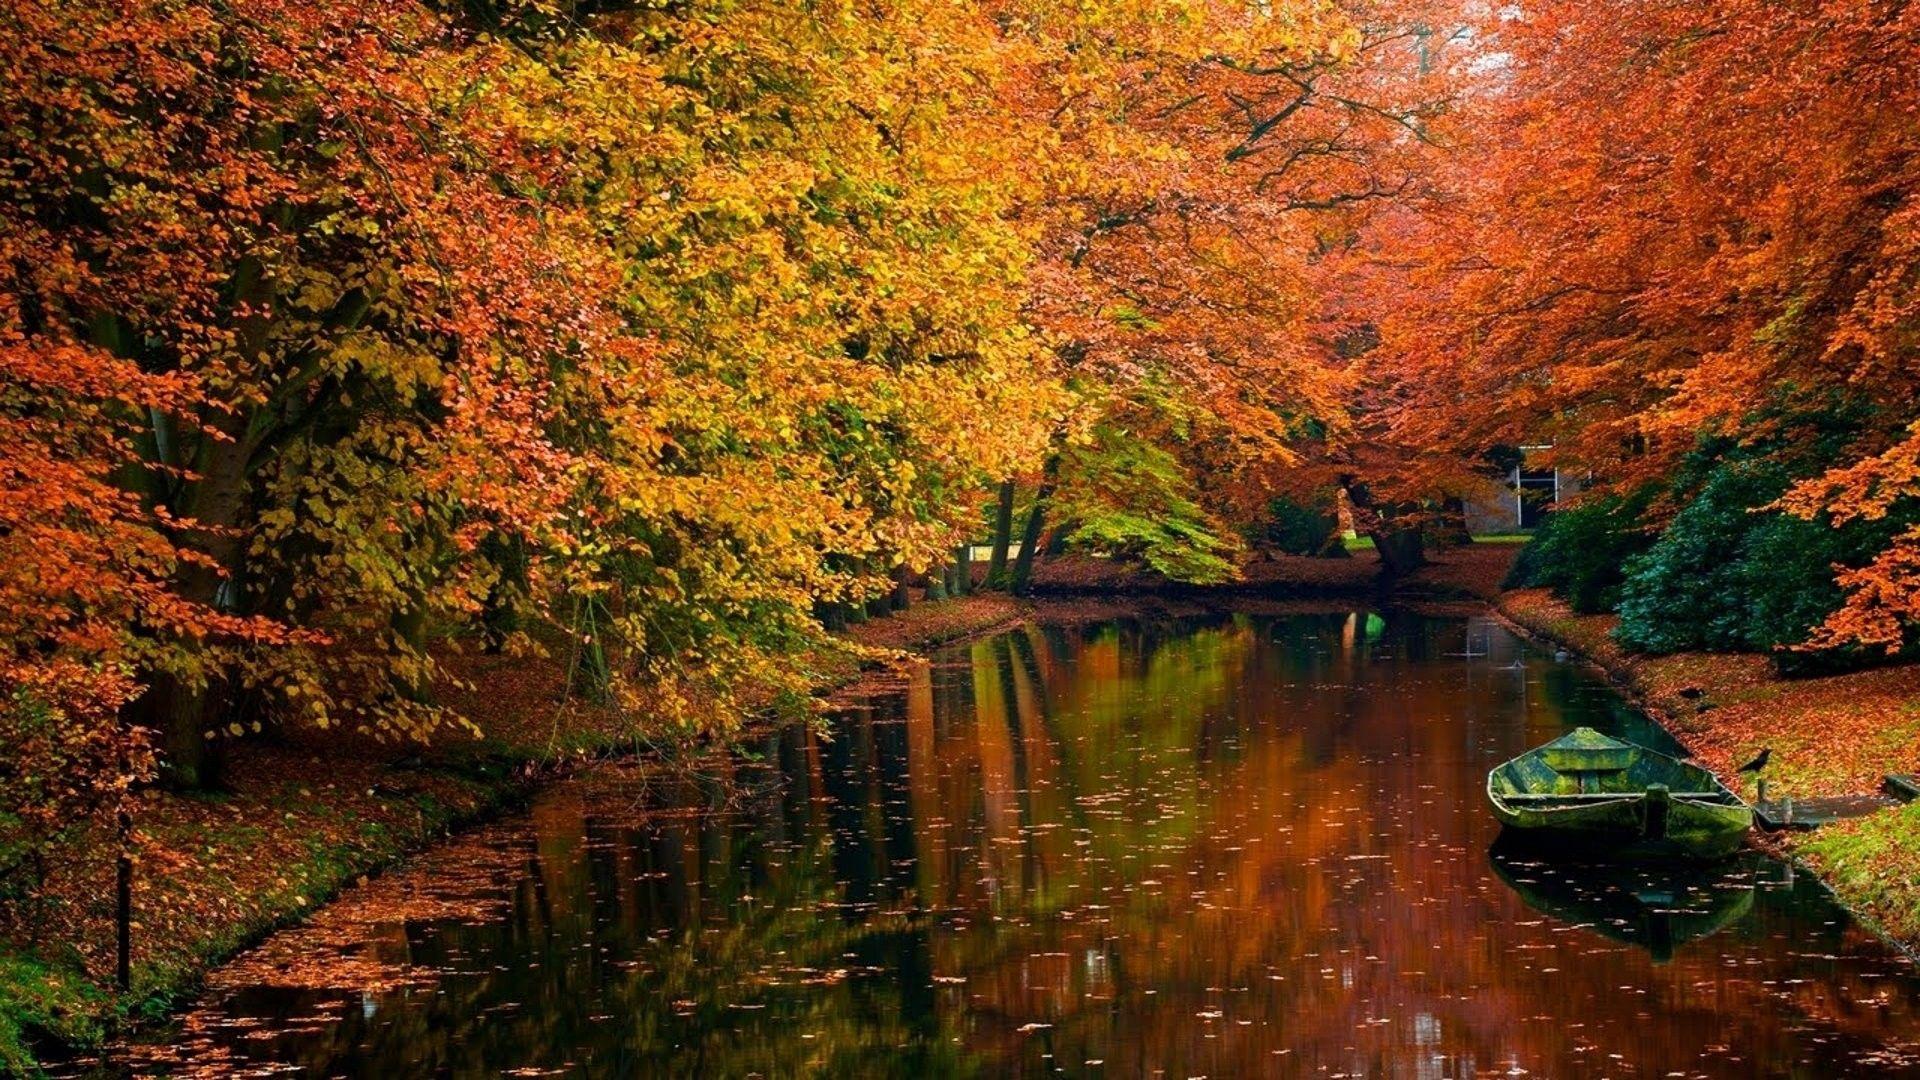 fall photos wallpaper river and fall wallpaper desktop hq wallpapers